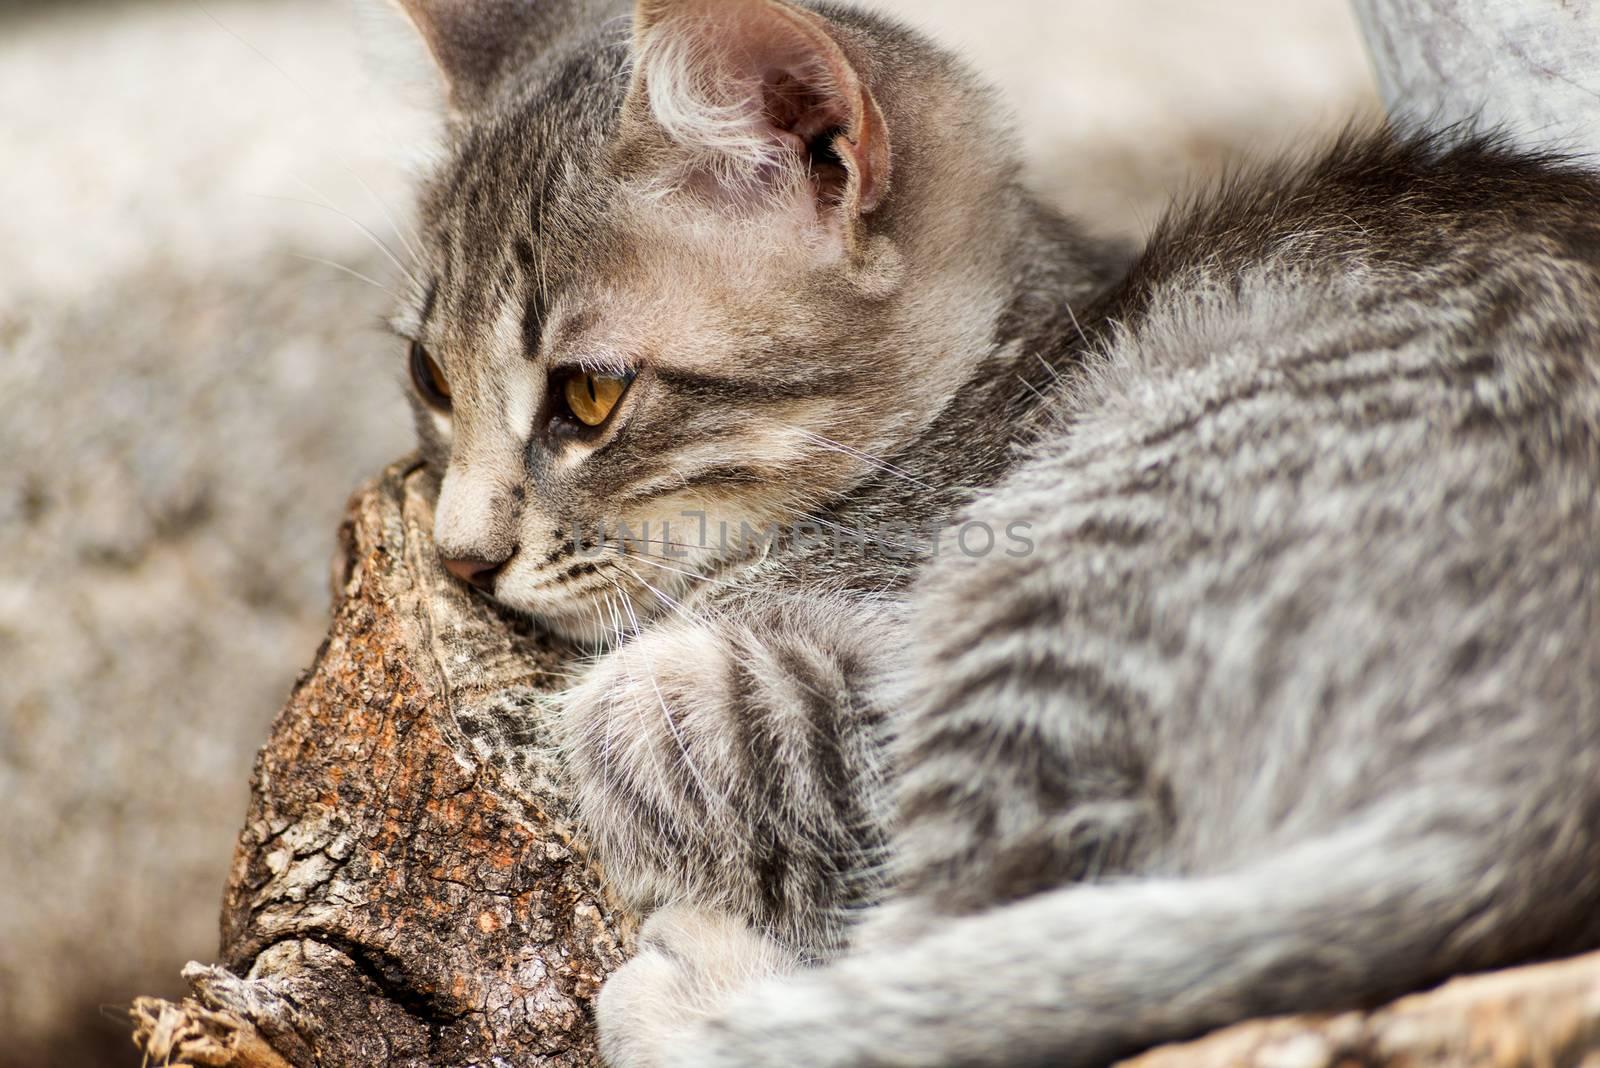 Little tabby cat relaxing